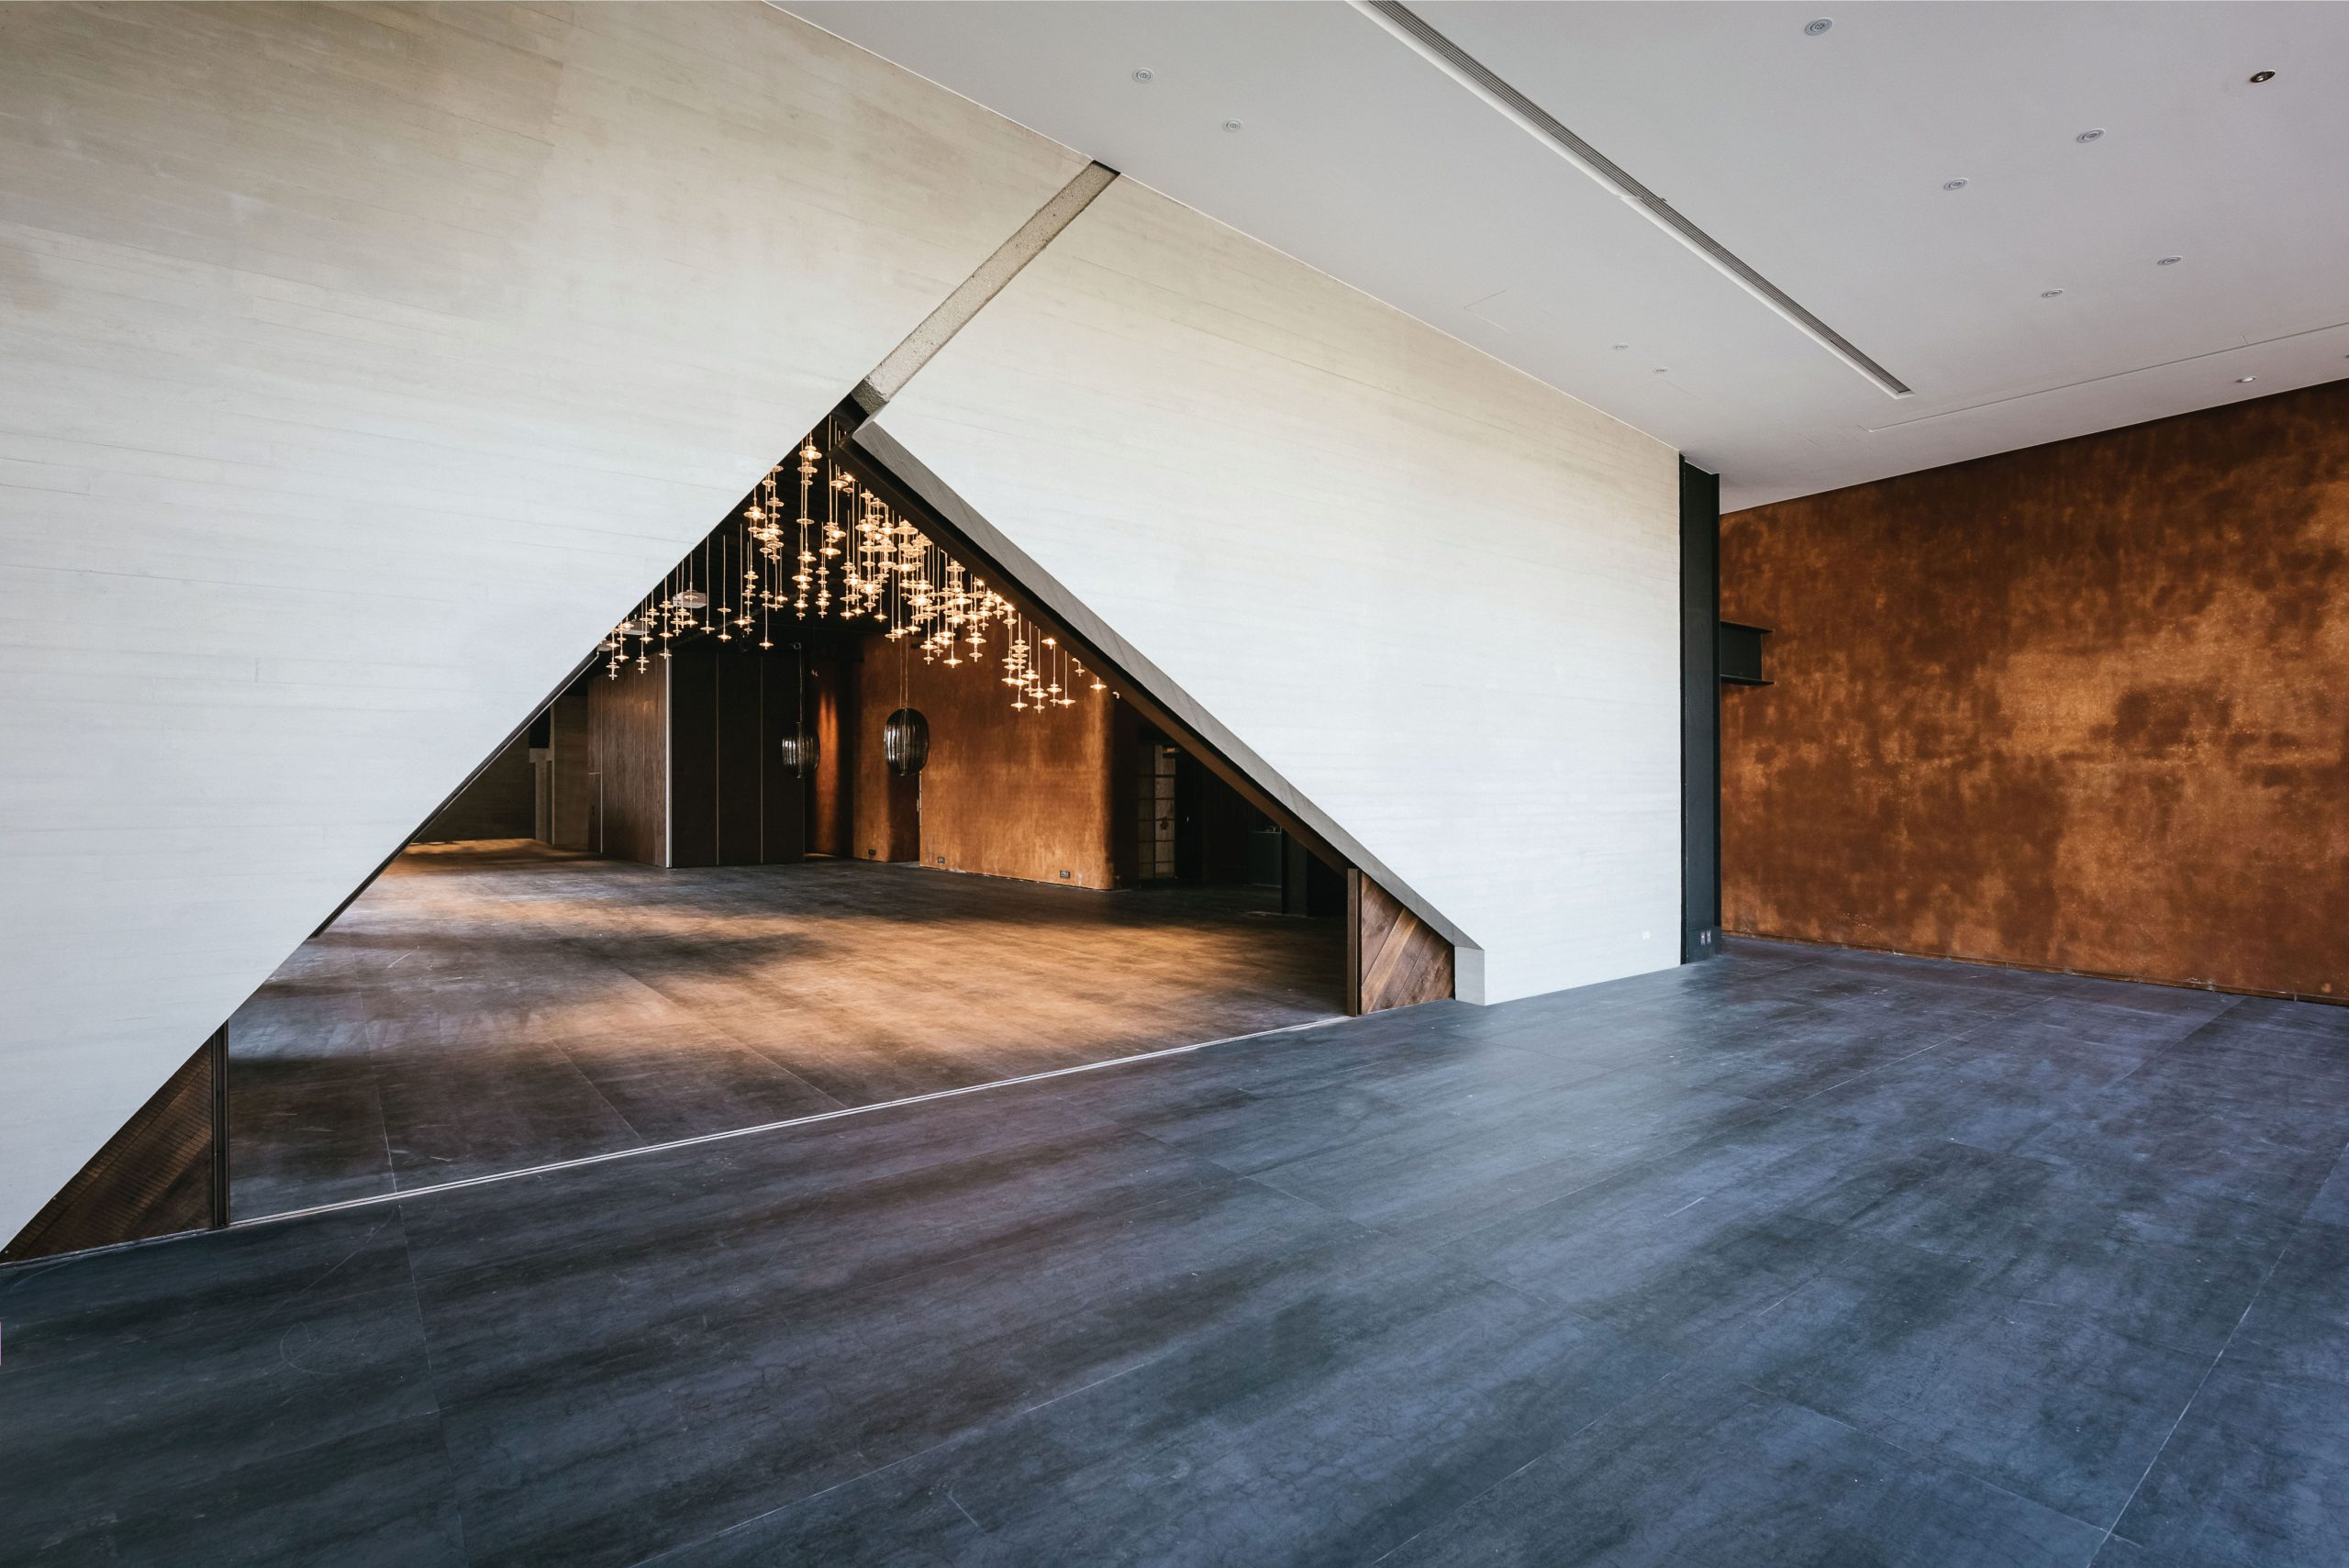 P1_与玥樓的核心設計,宴會廳入口處的人字門,穿過這扇門,也將開啟人生新的篇章。